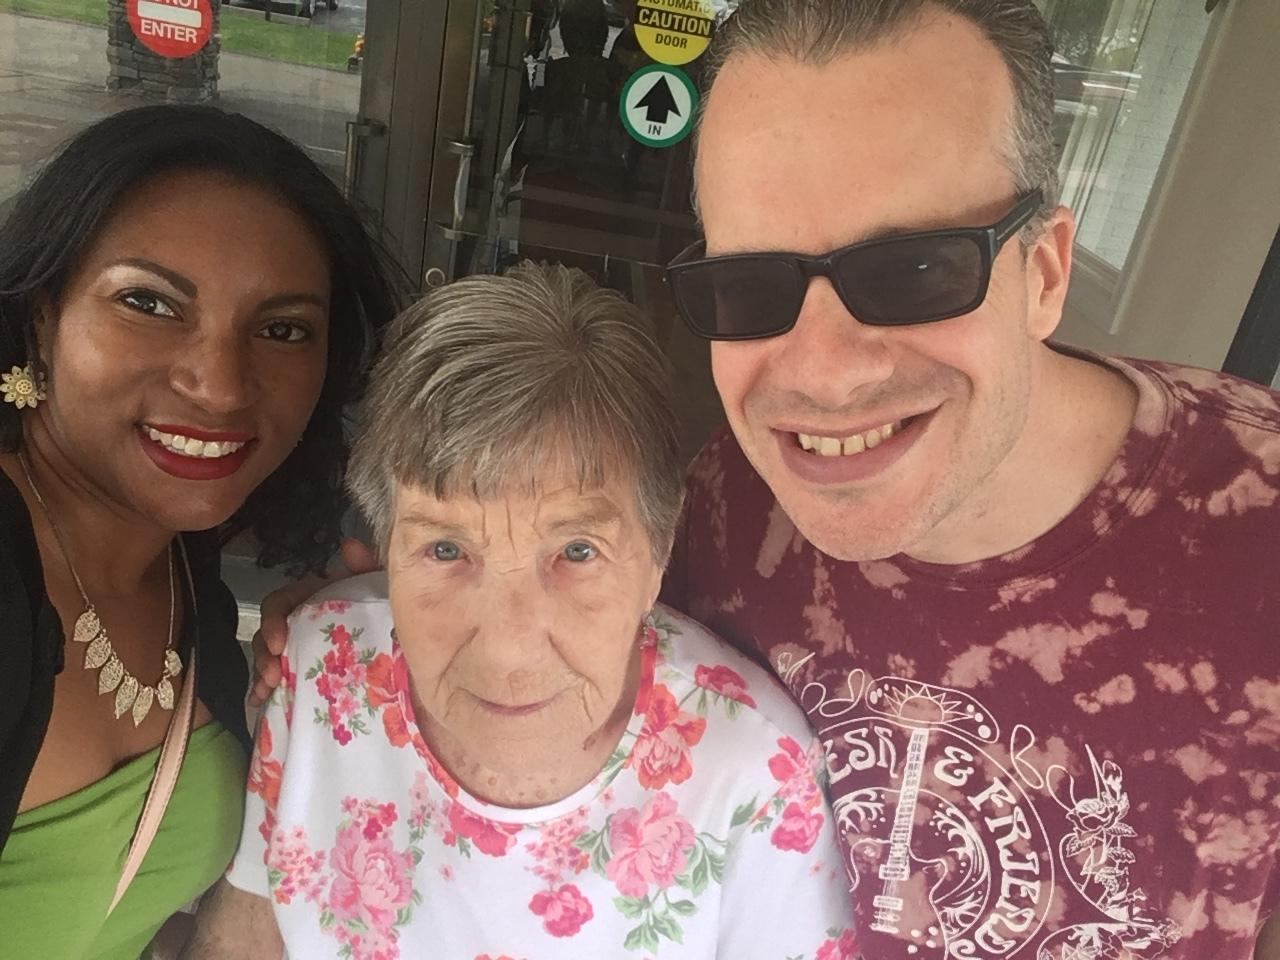 Grandma Betty had a huge bash for her 90th birthday, she had a blast